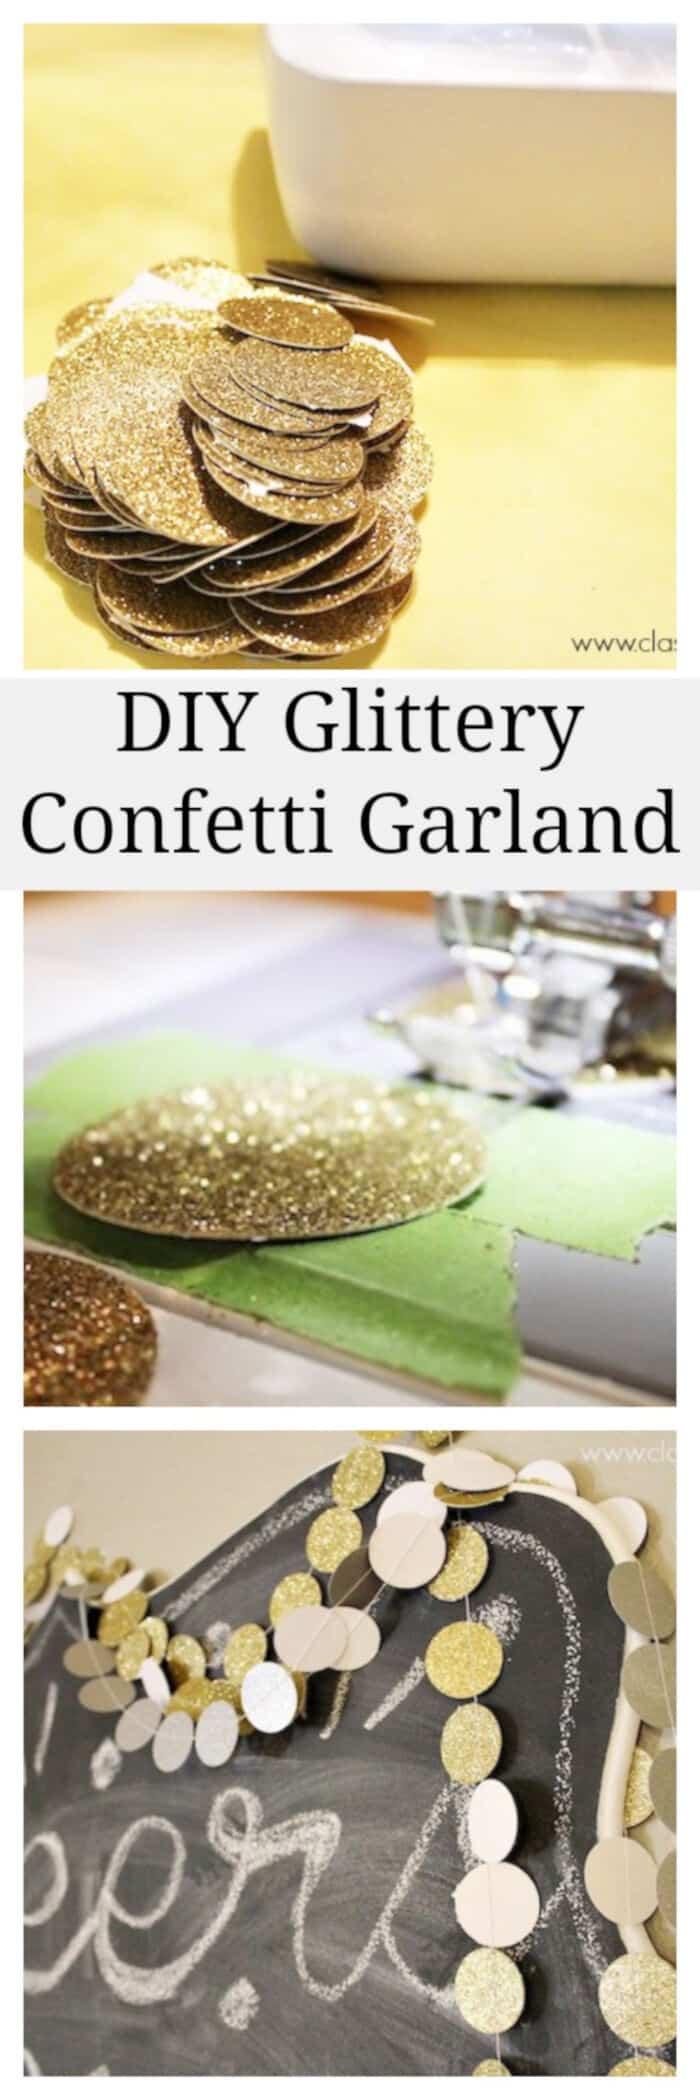 DIY Glittery Confetti Garland by Classy Clutter